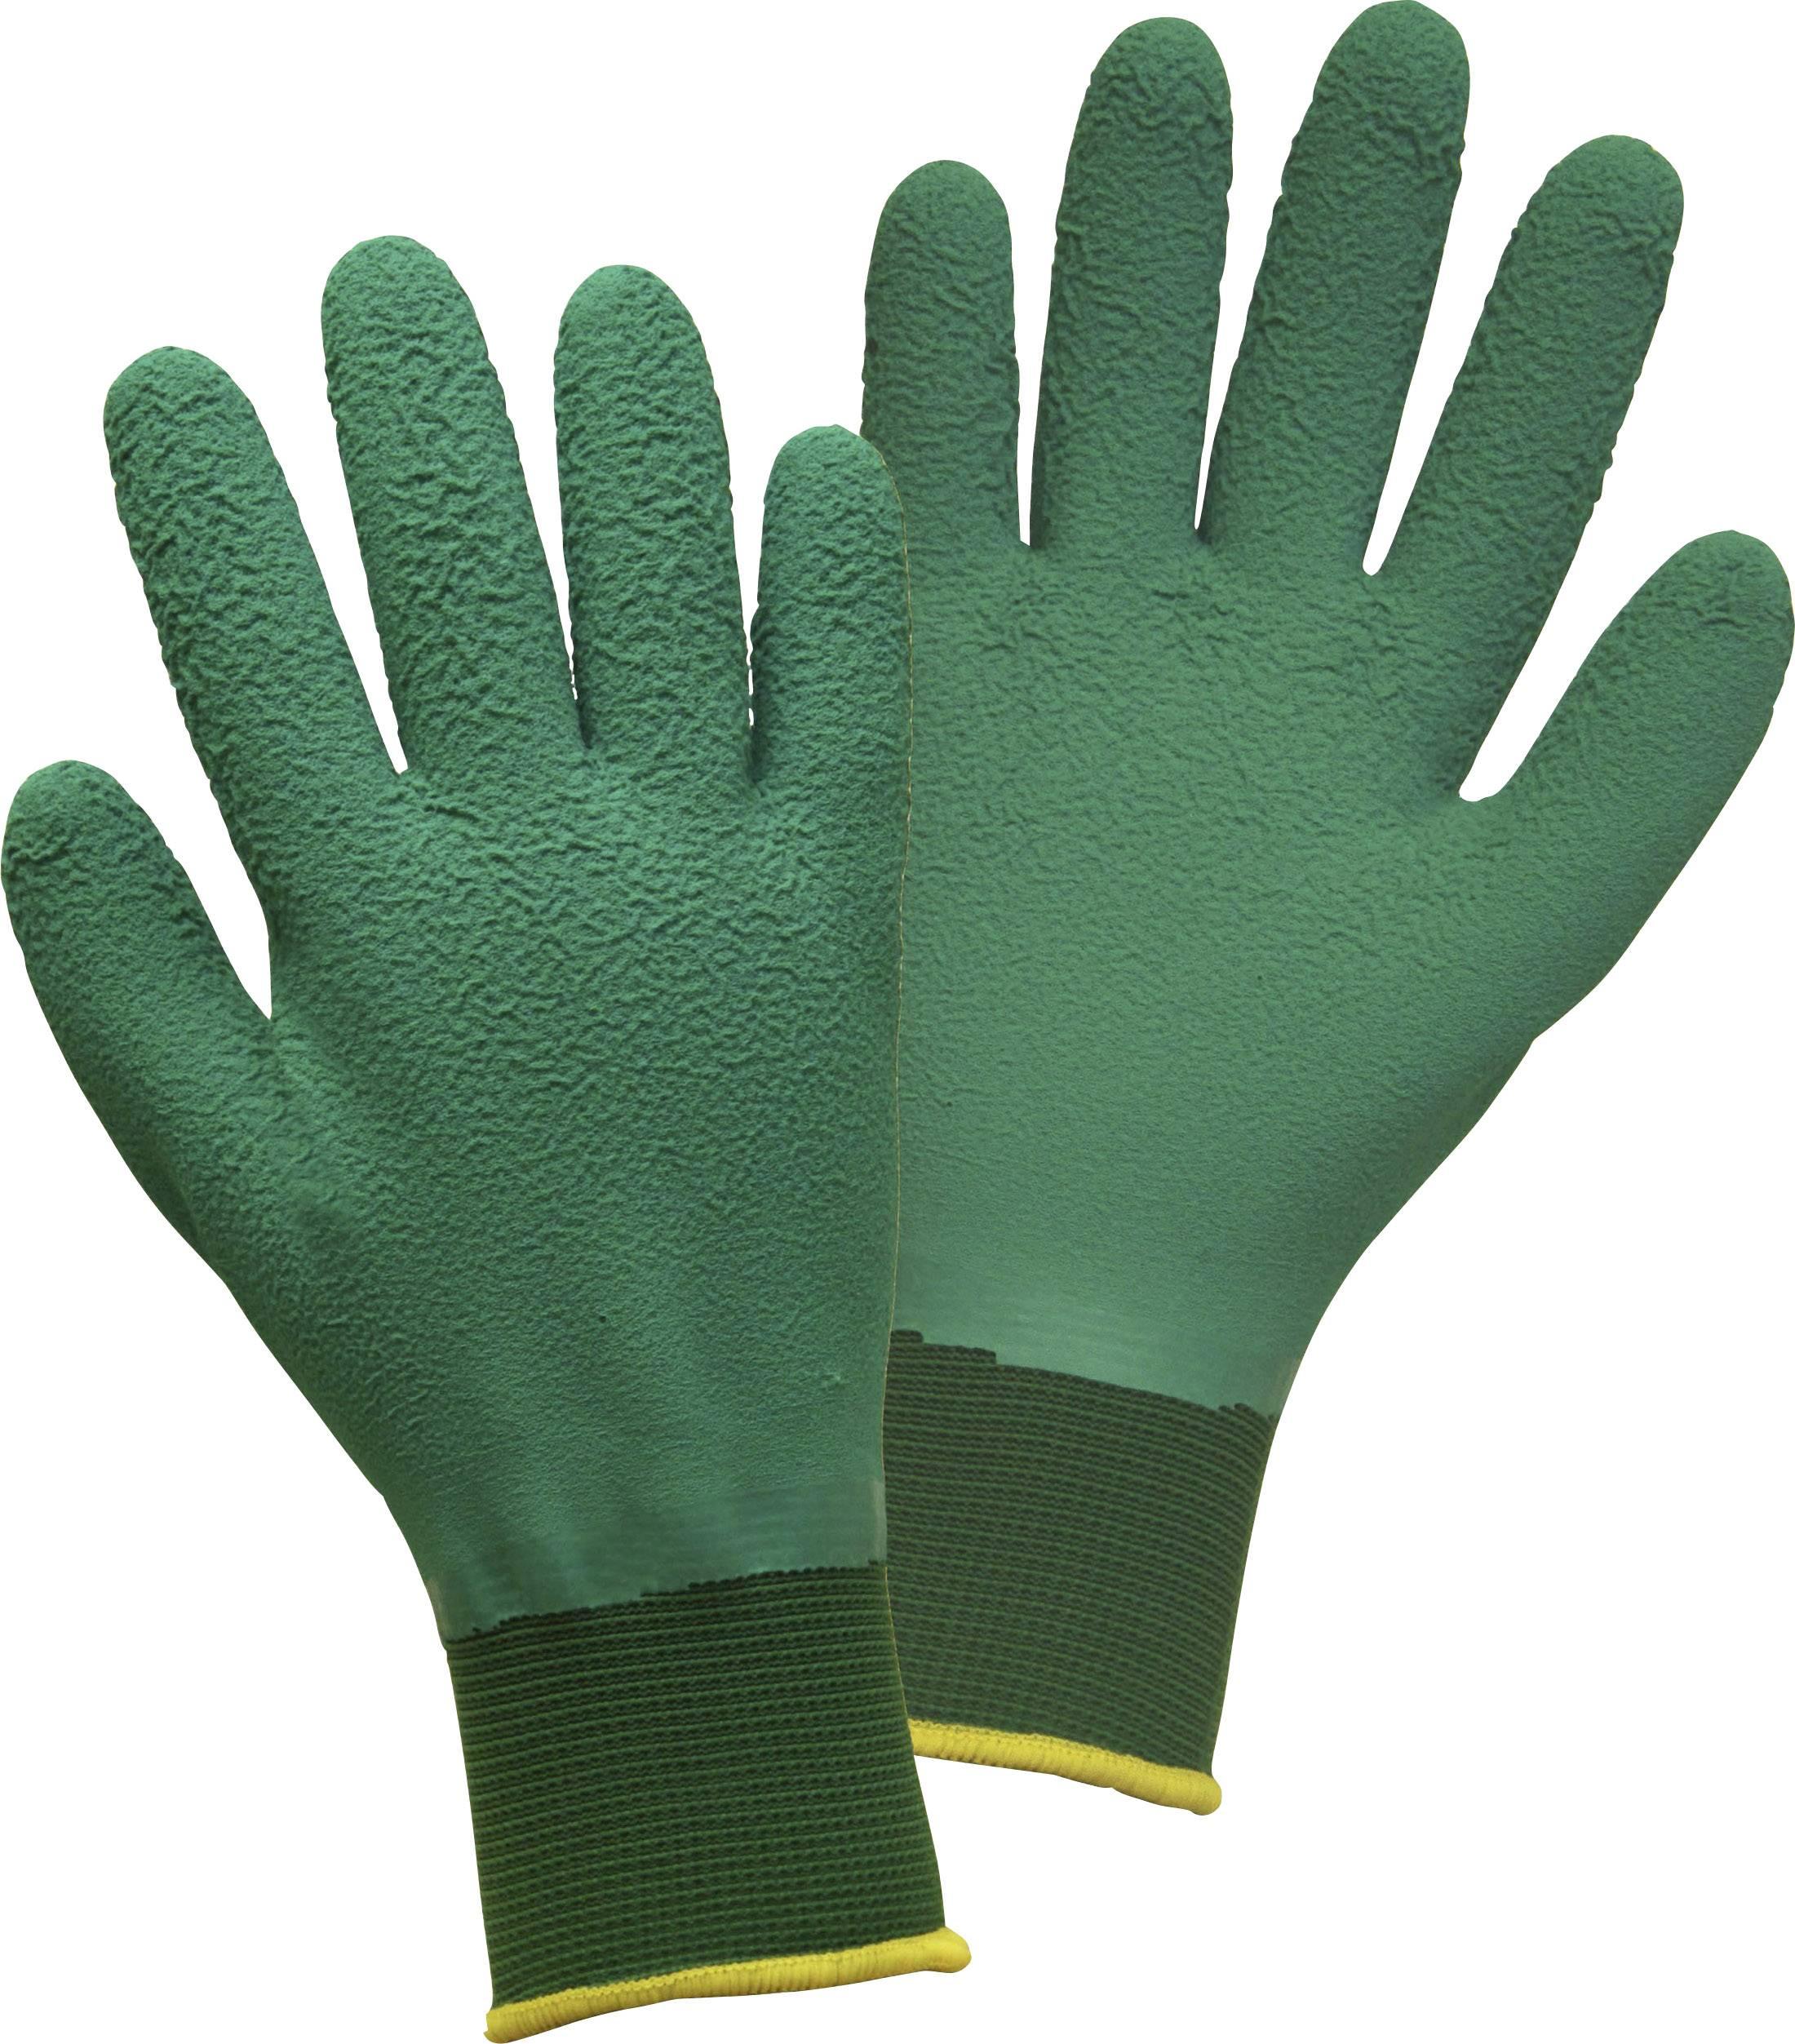 Zahradní rukavice FerdyF. Rosalind Garten 1494, velikost rukavic: 8, M